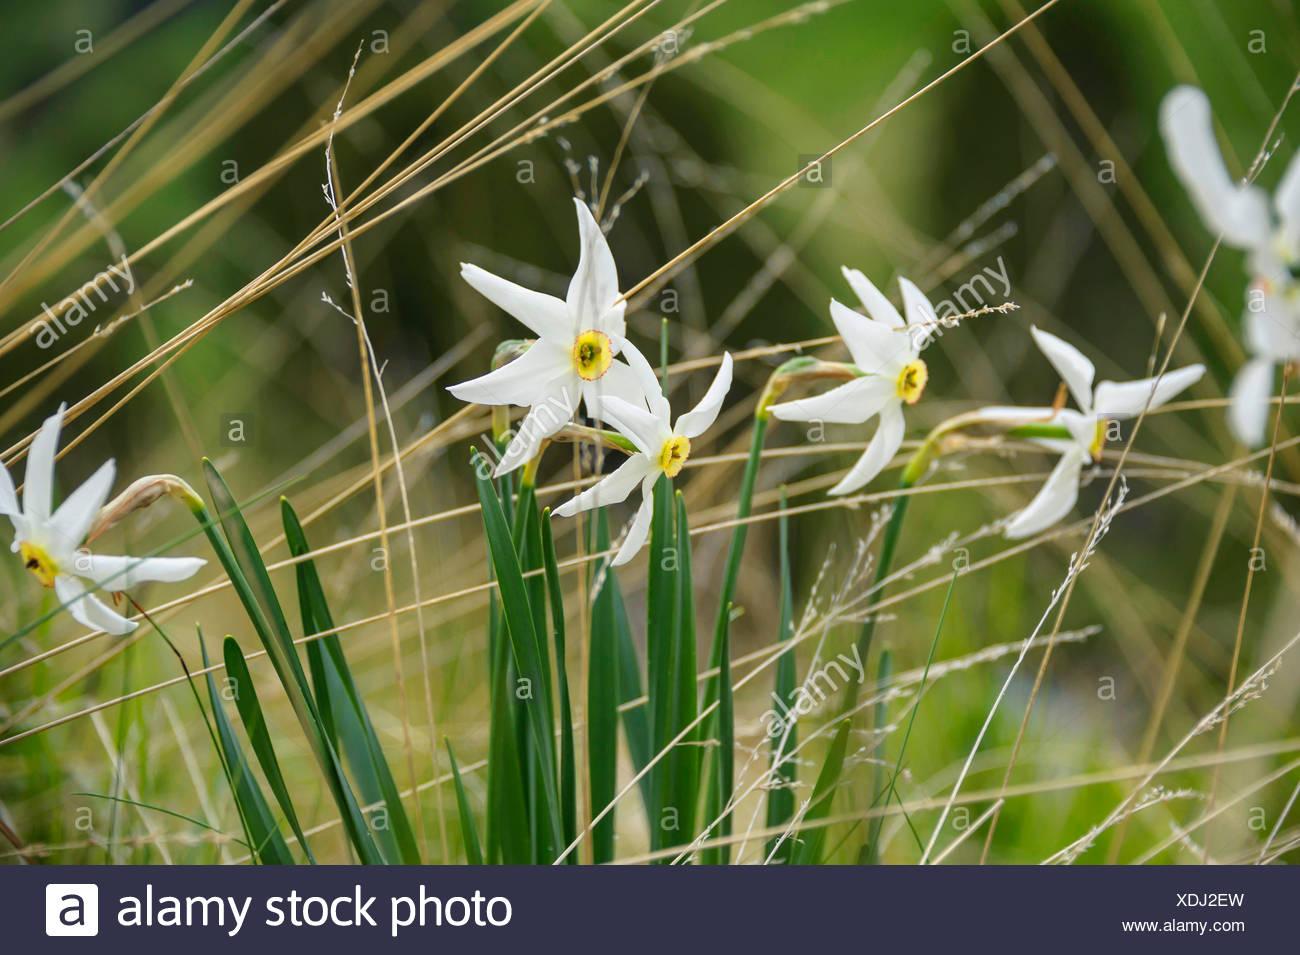 pheasant's-eye daffodil, pheasant's-eye narcissus, poet's narcissus (Narcissus poeticus), blooming in a meadow, Andorra, Andorra - Stock Image